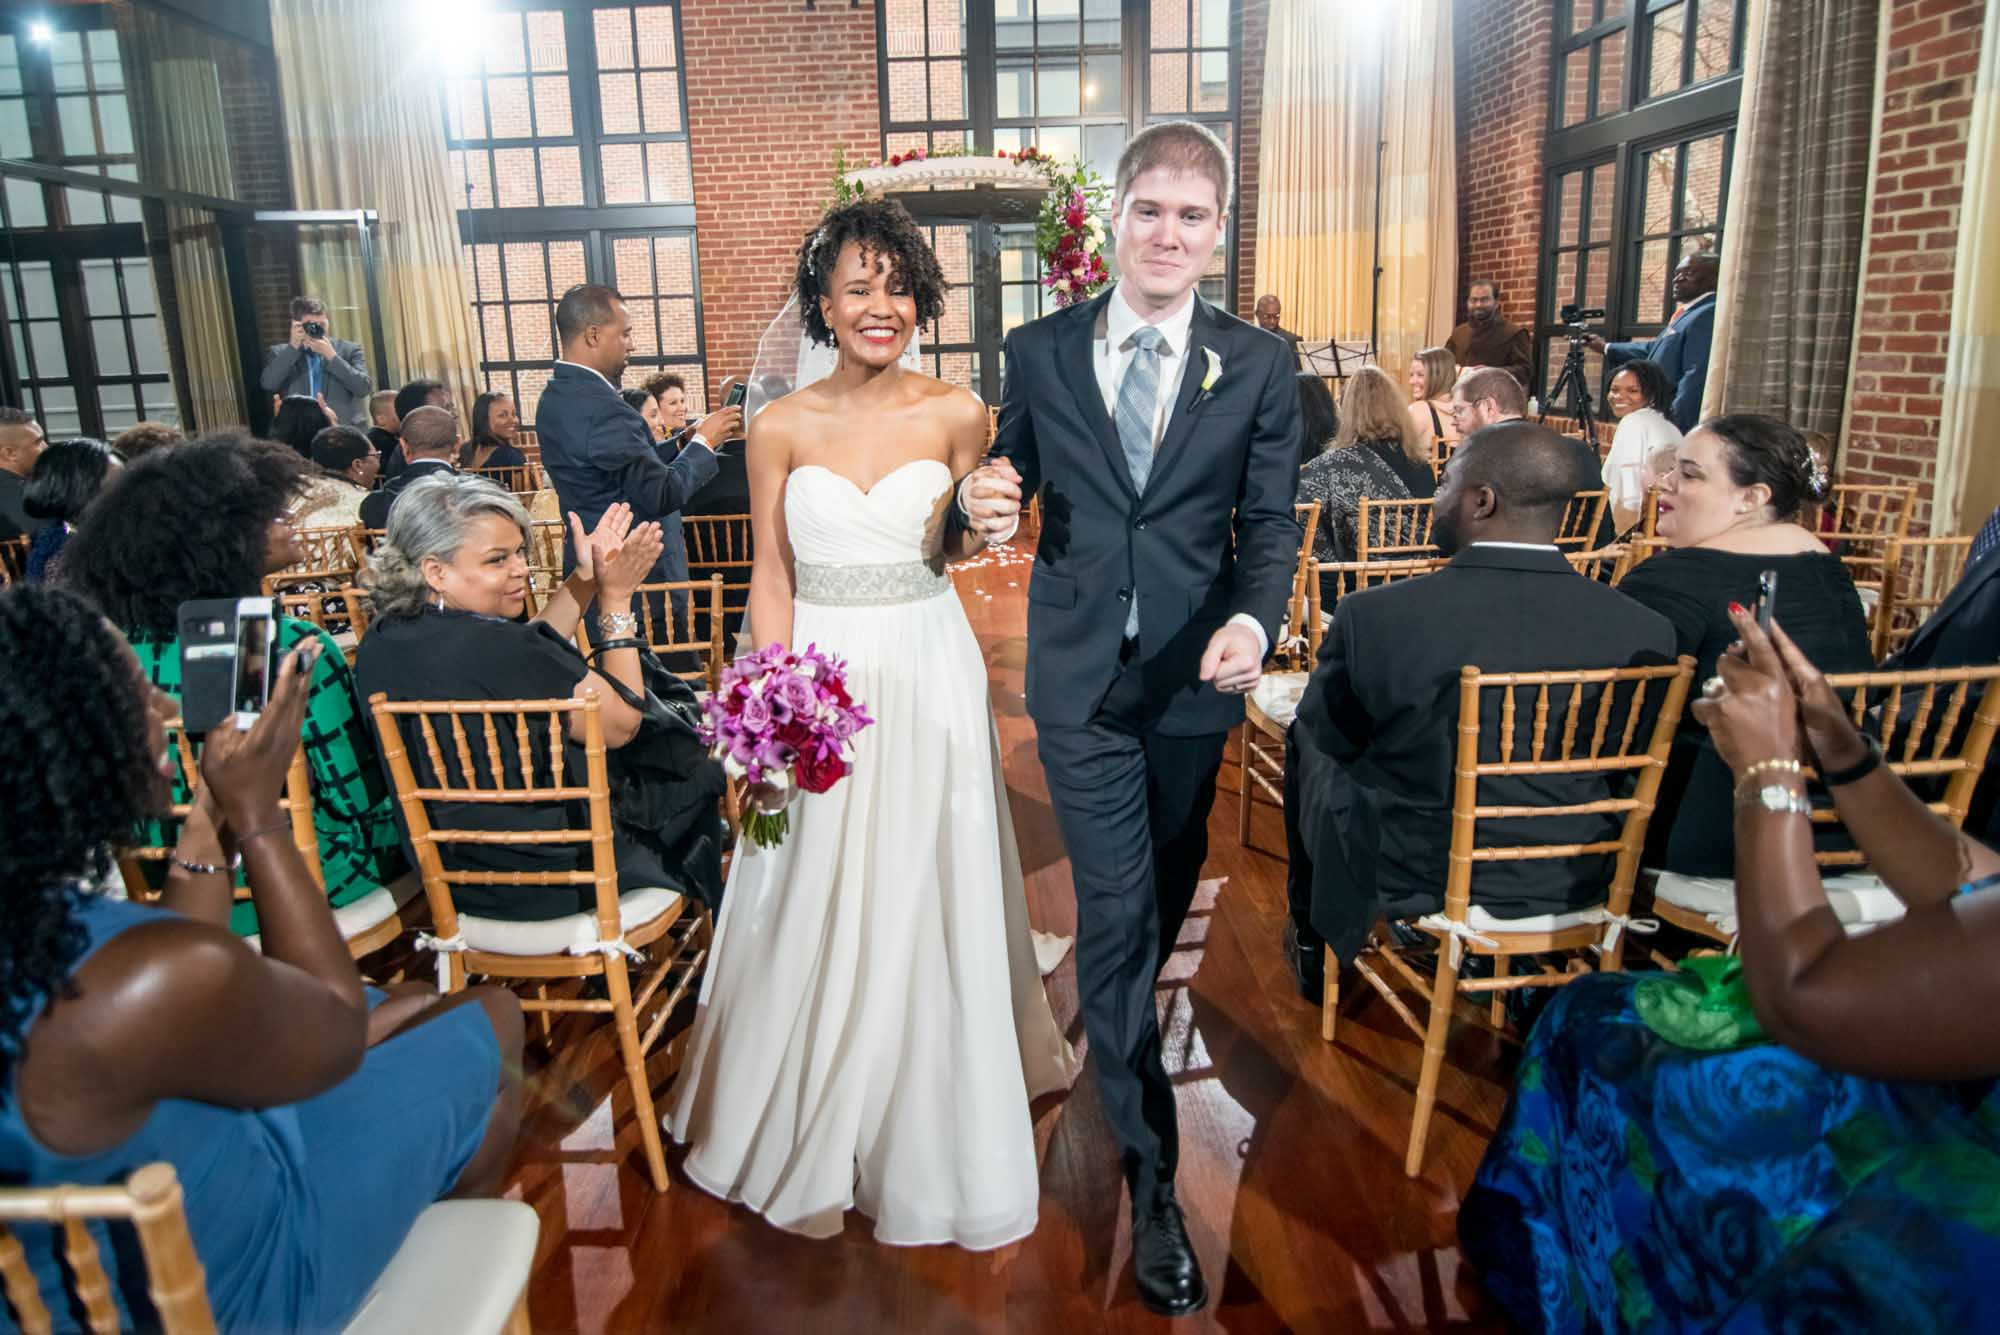 dc+metro+wedding+photographer+vadym+guliuk+photography+wedding+ceremony-2029.jpg